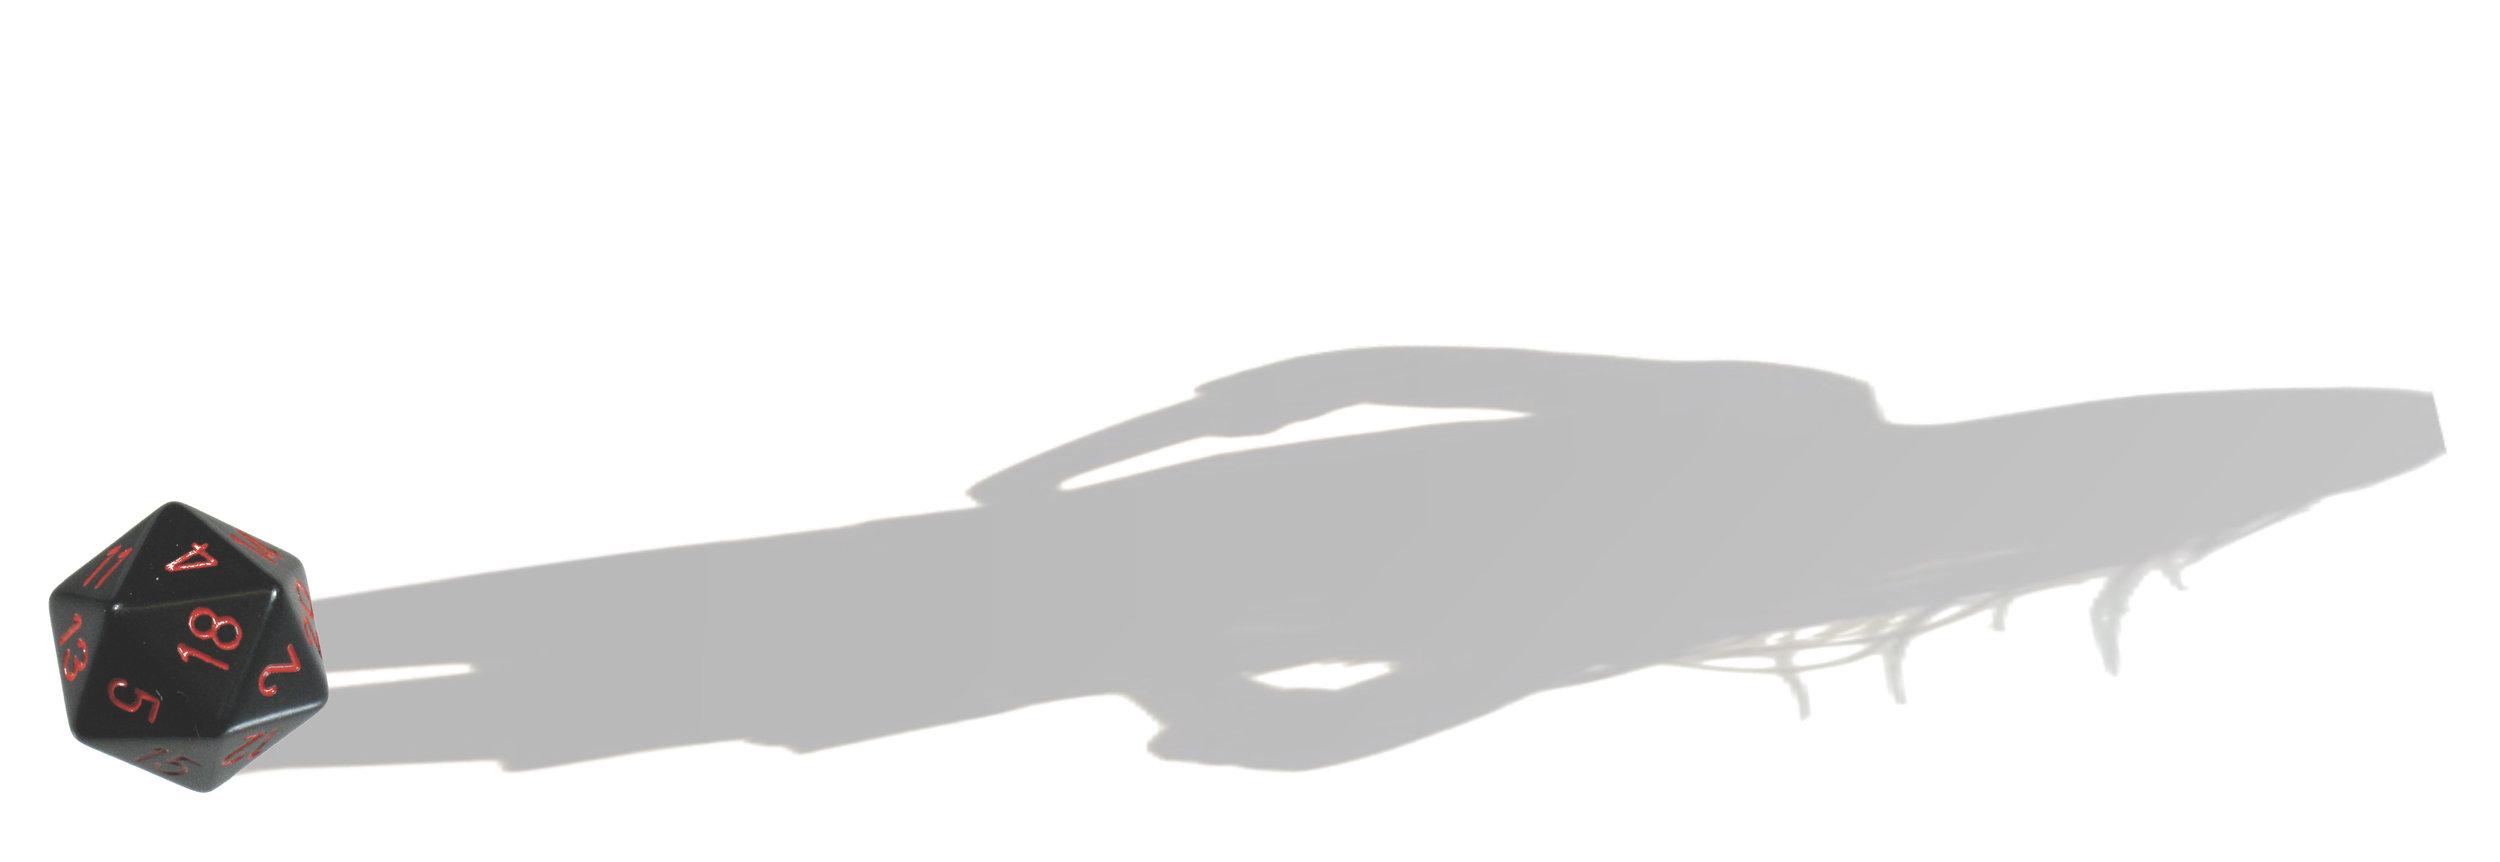 SKM Program Graphic 2.jpg